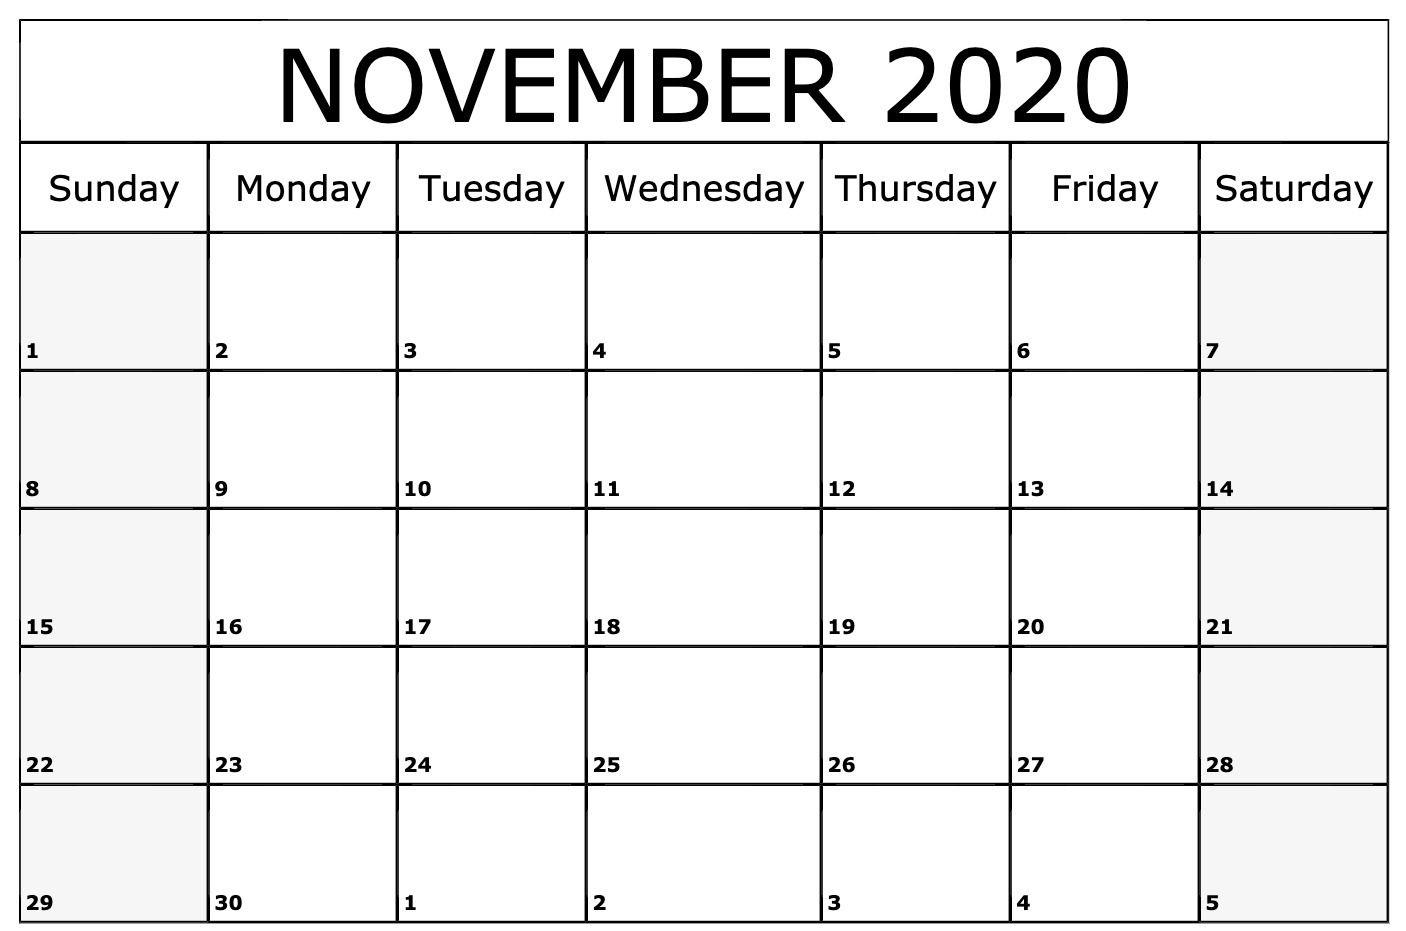 November 2020 Calendar Printable Template | Printable